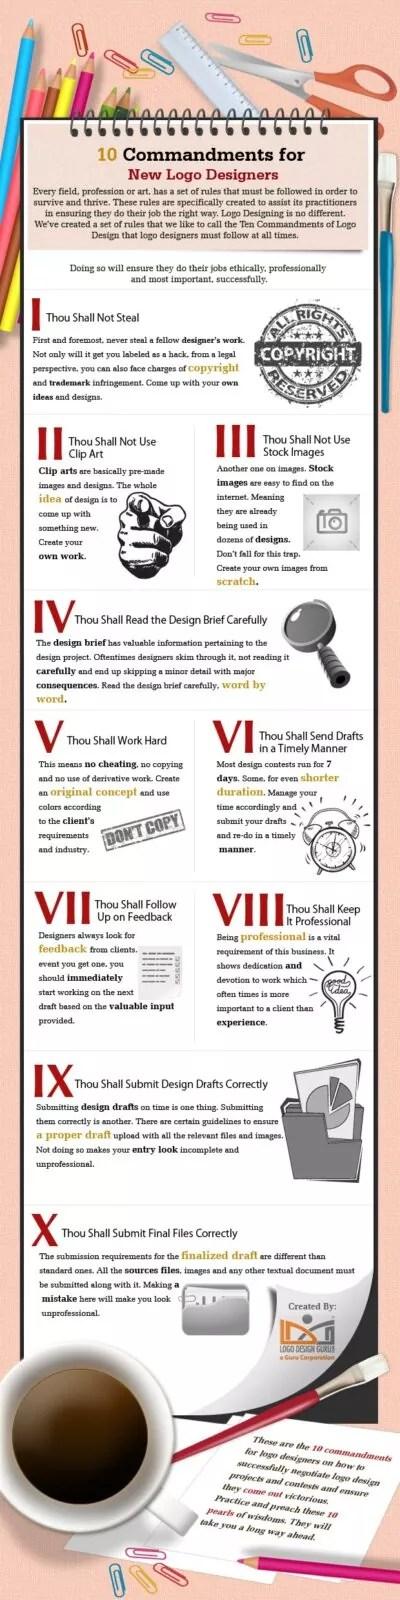 commandments infographic e1351079708478 - 10 Commandments for New Logo Designers